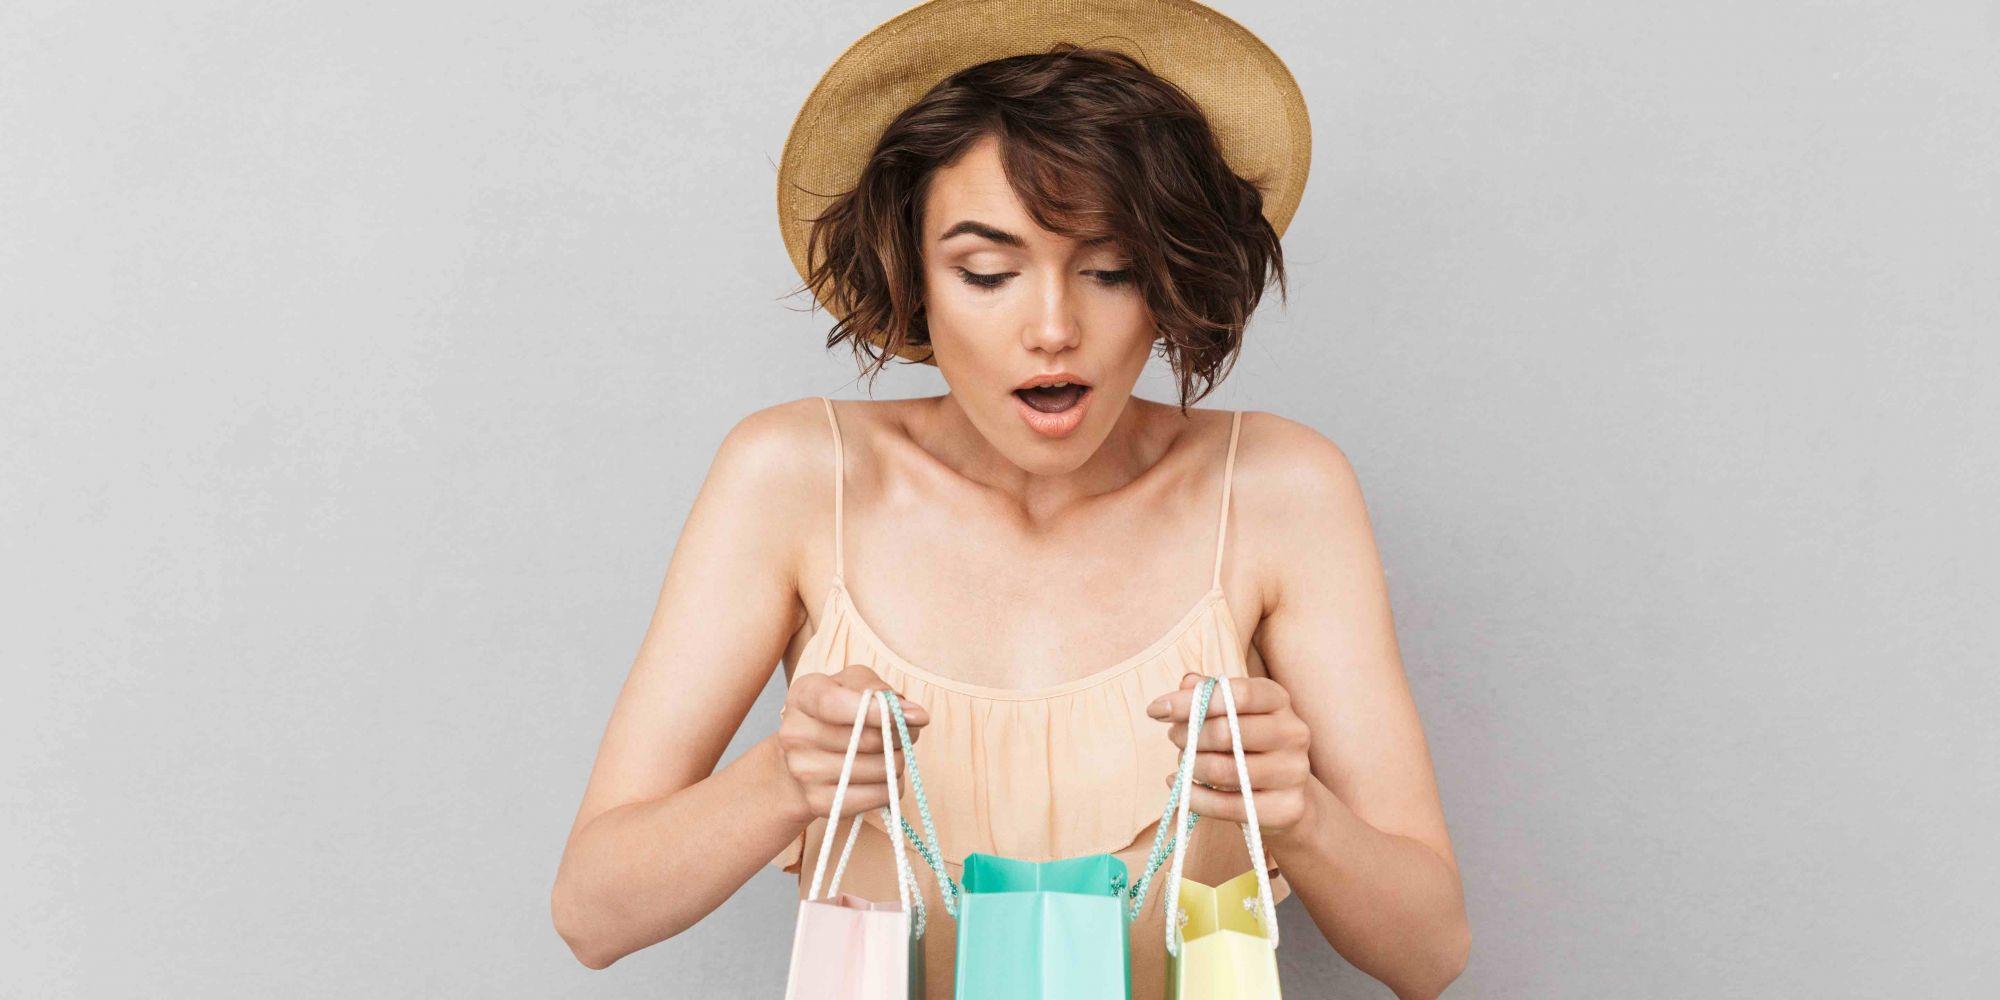 Keeping 'Em Happy: How Indie Beauty Brands Handle Customer Service